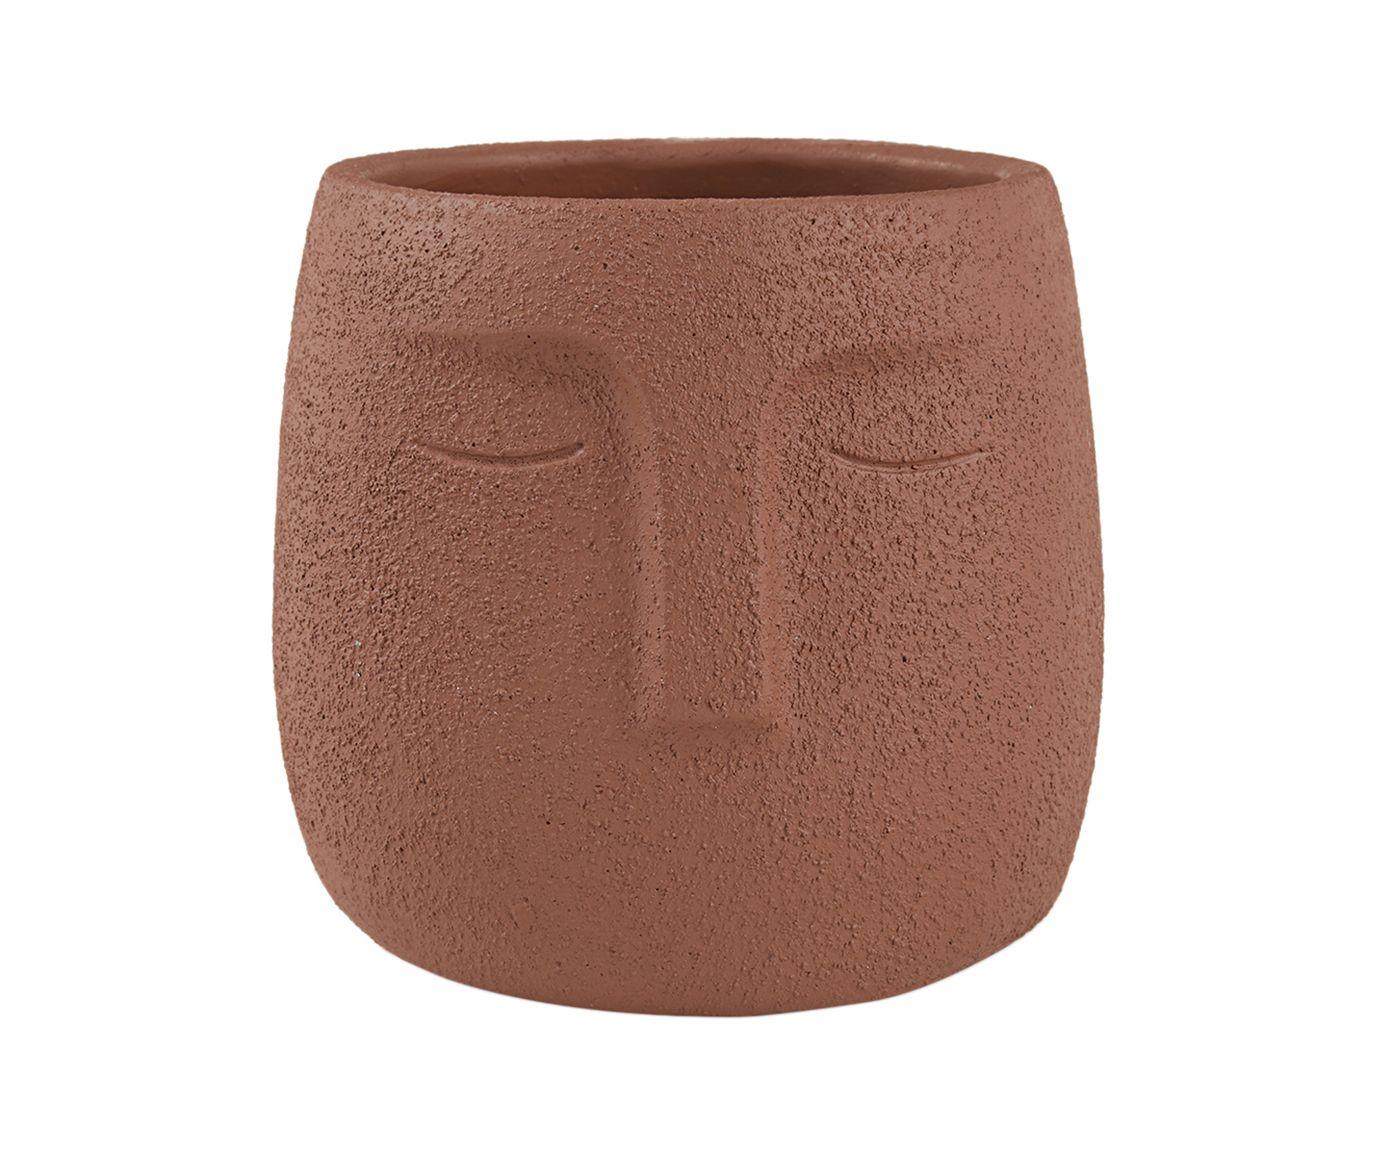 Cachepot Dimitra Marrom - 14,5cm | Westwing.com.br